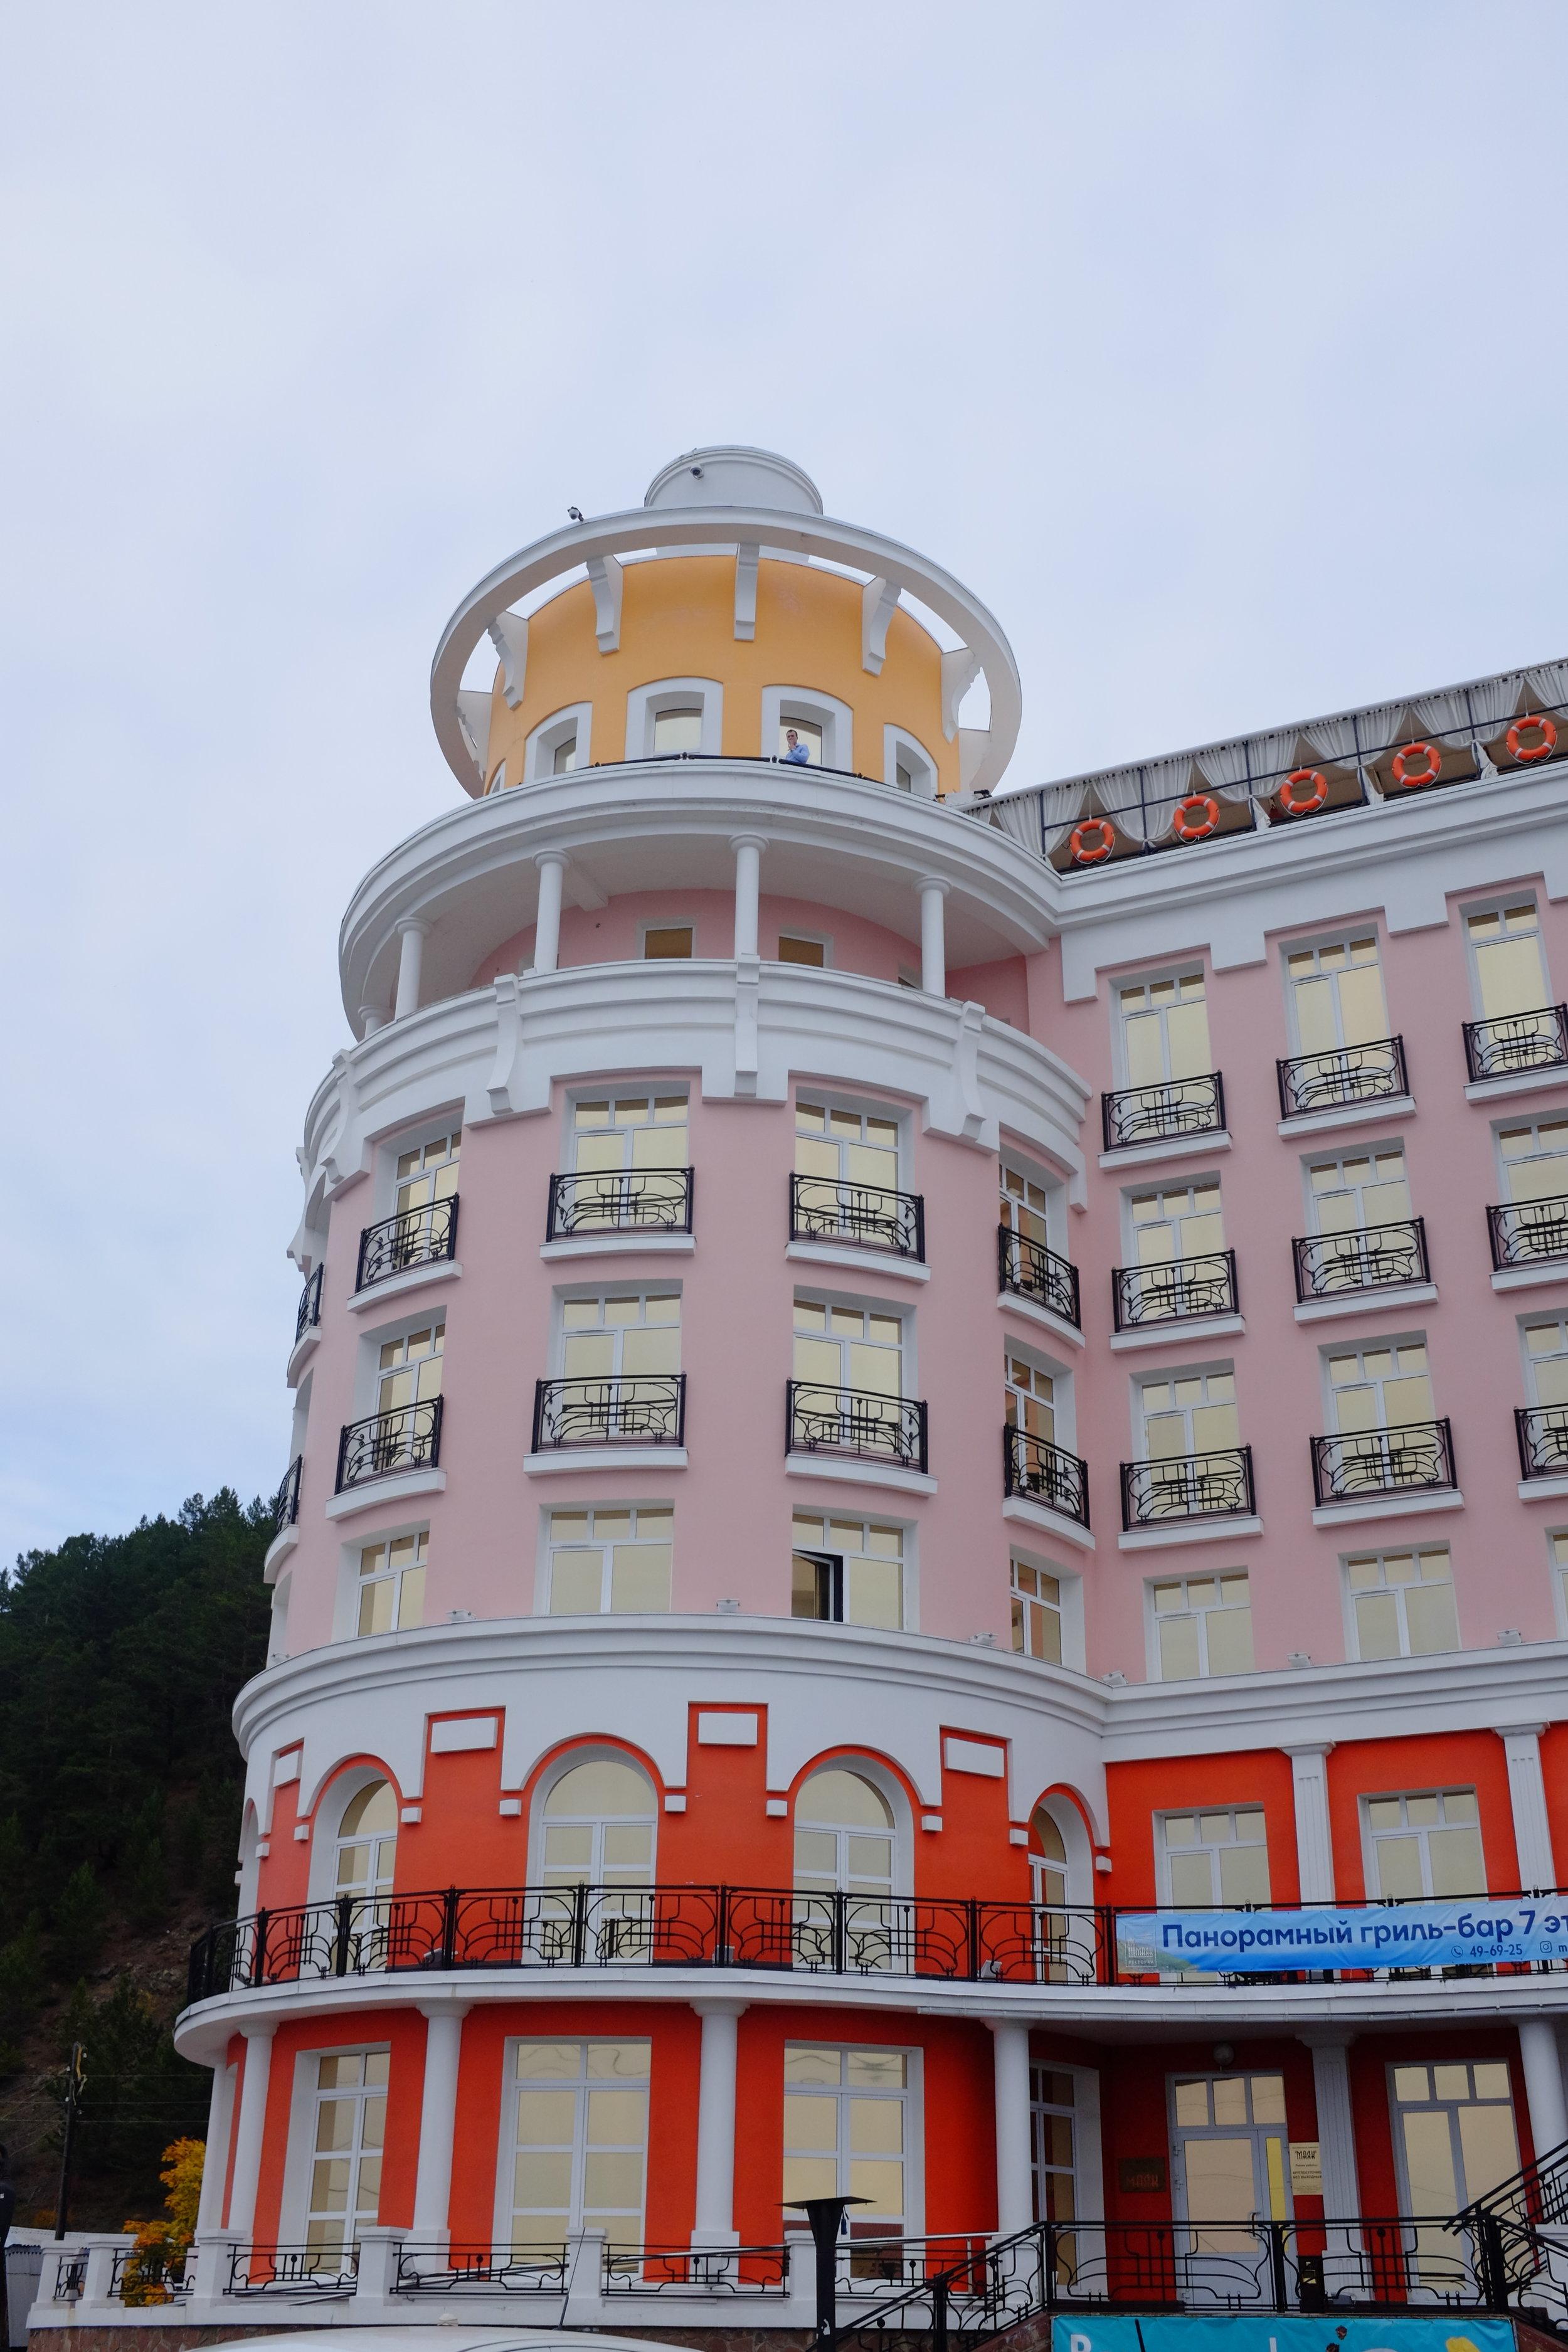 listvyanka grand budapest hotel